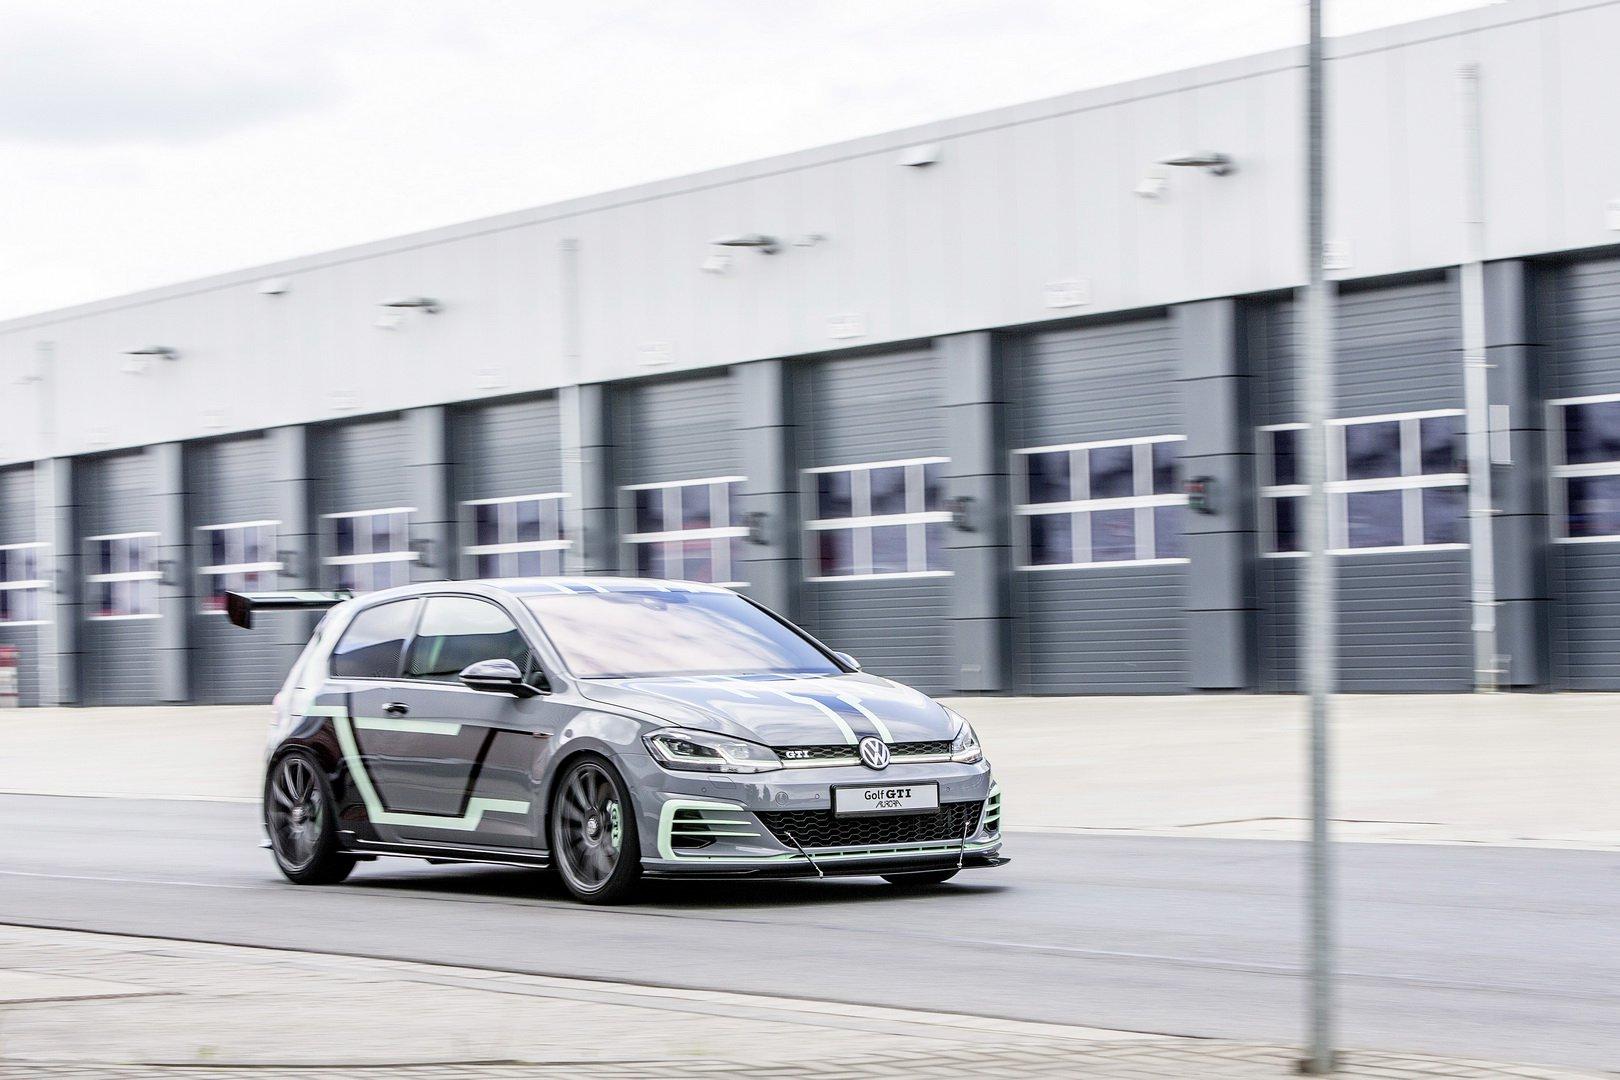 VW-Golf-GTI-Aurora-1